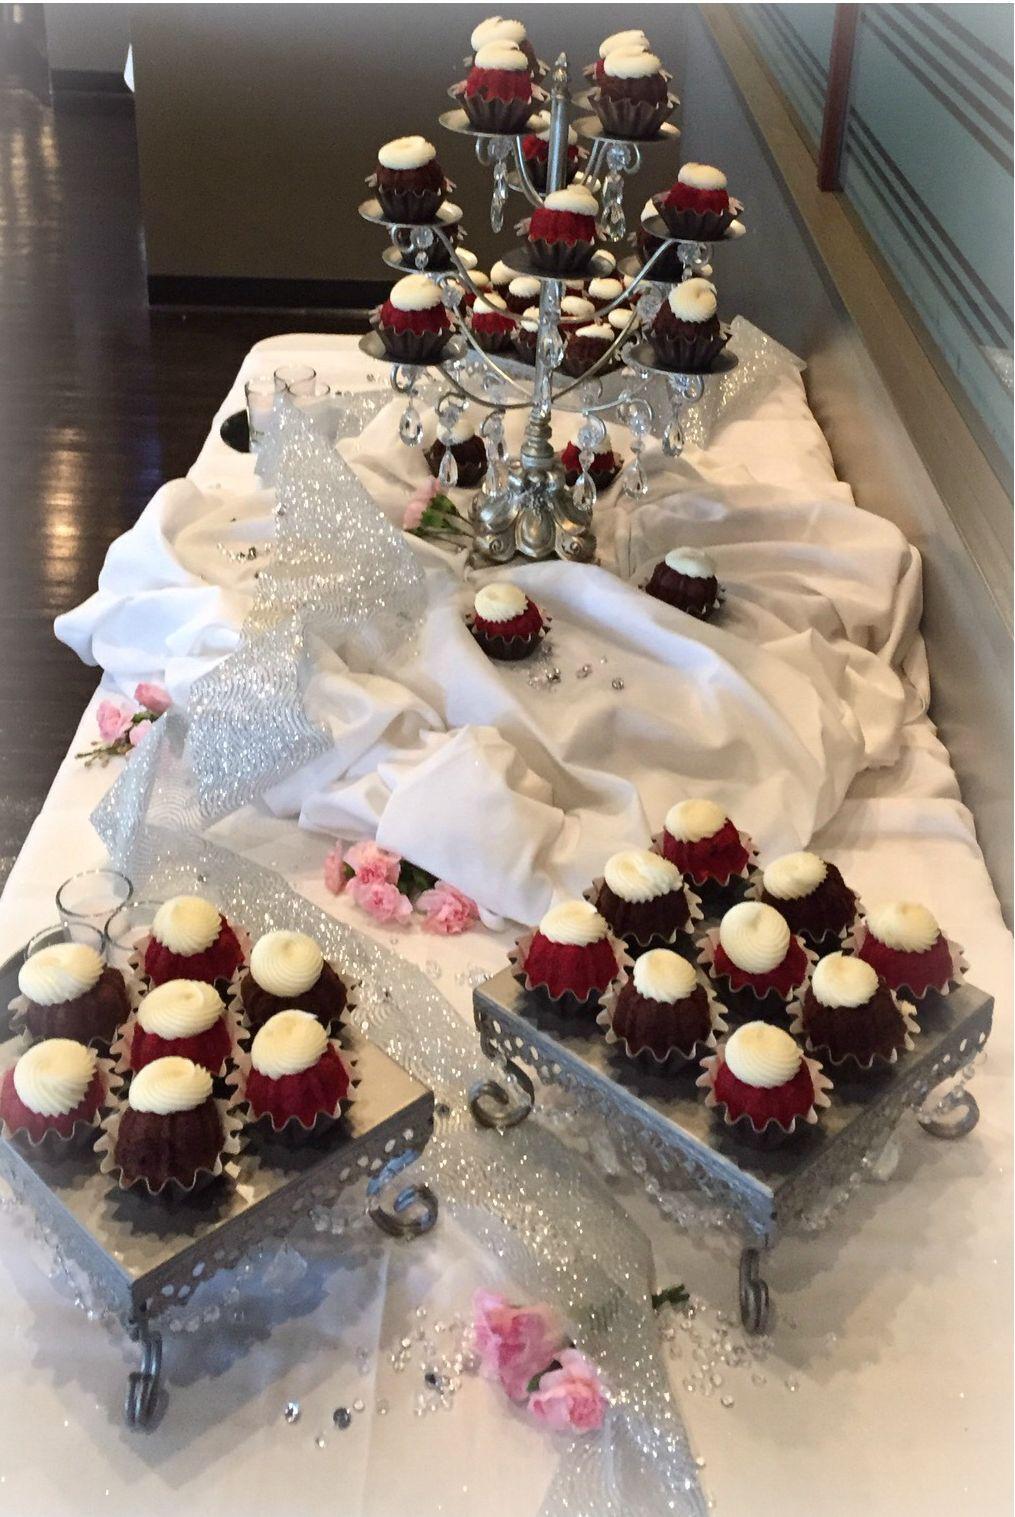 Bundtini dessert display lakeridge golf club in reno nv